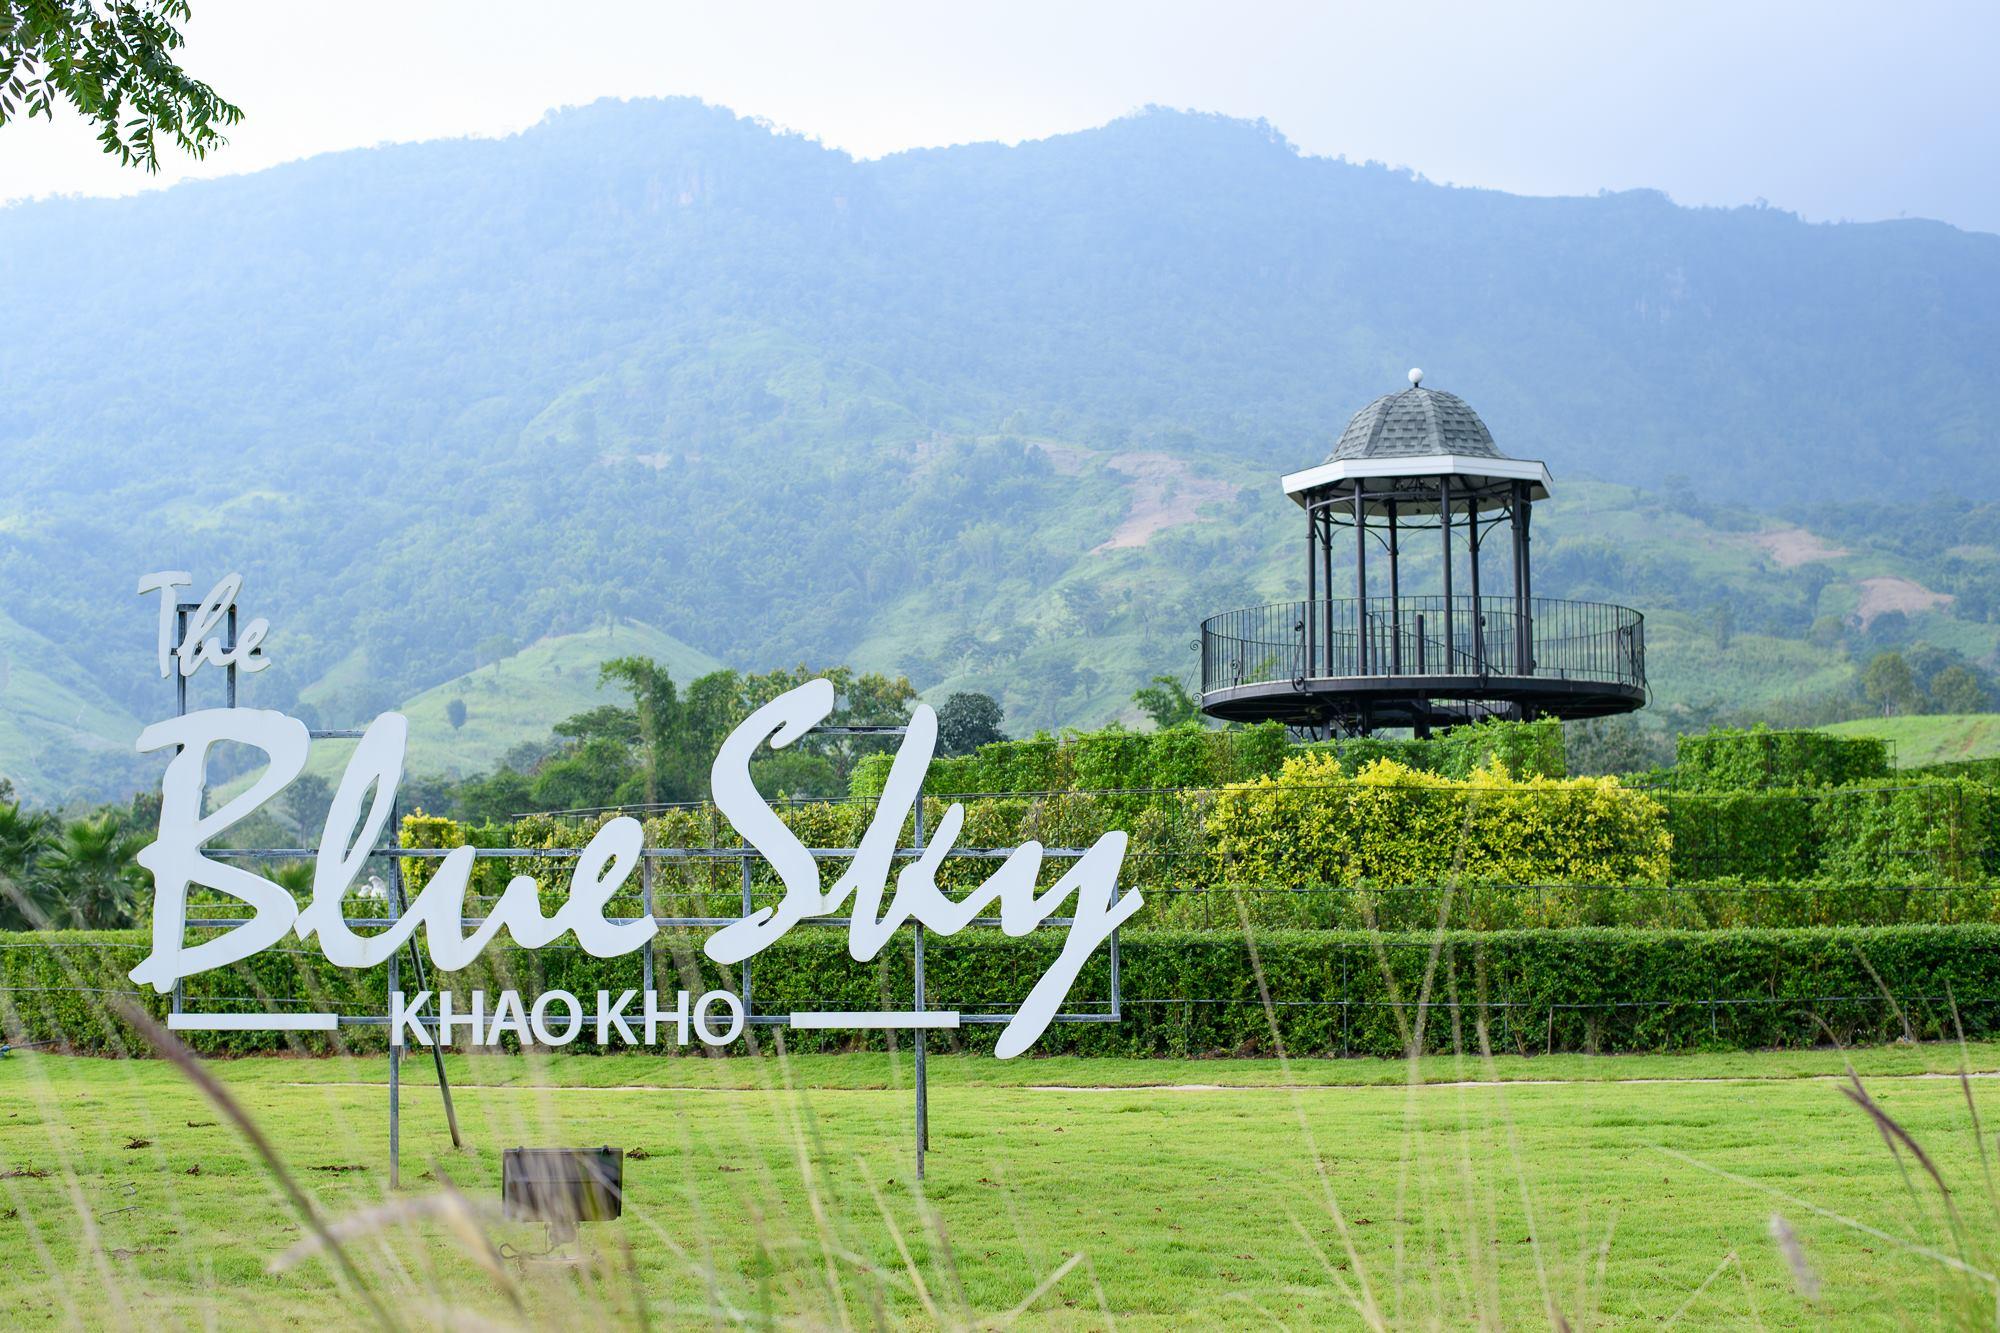 The Blue Sky Resort เขาค้อ นครศรีดีย์